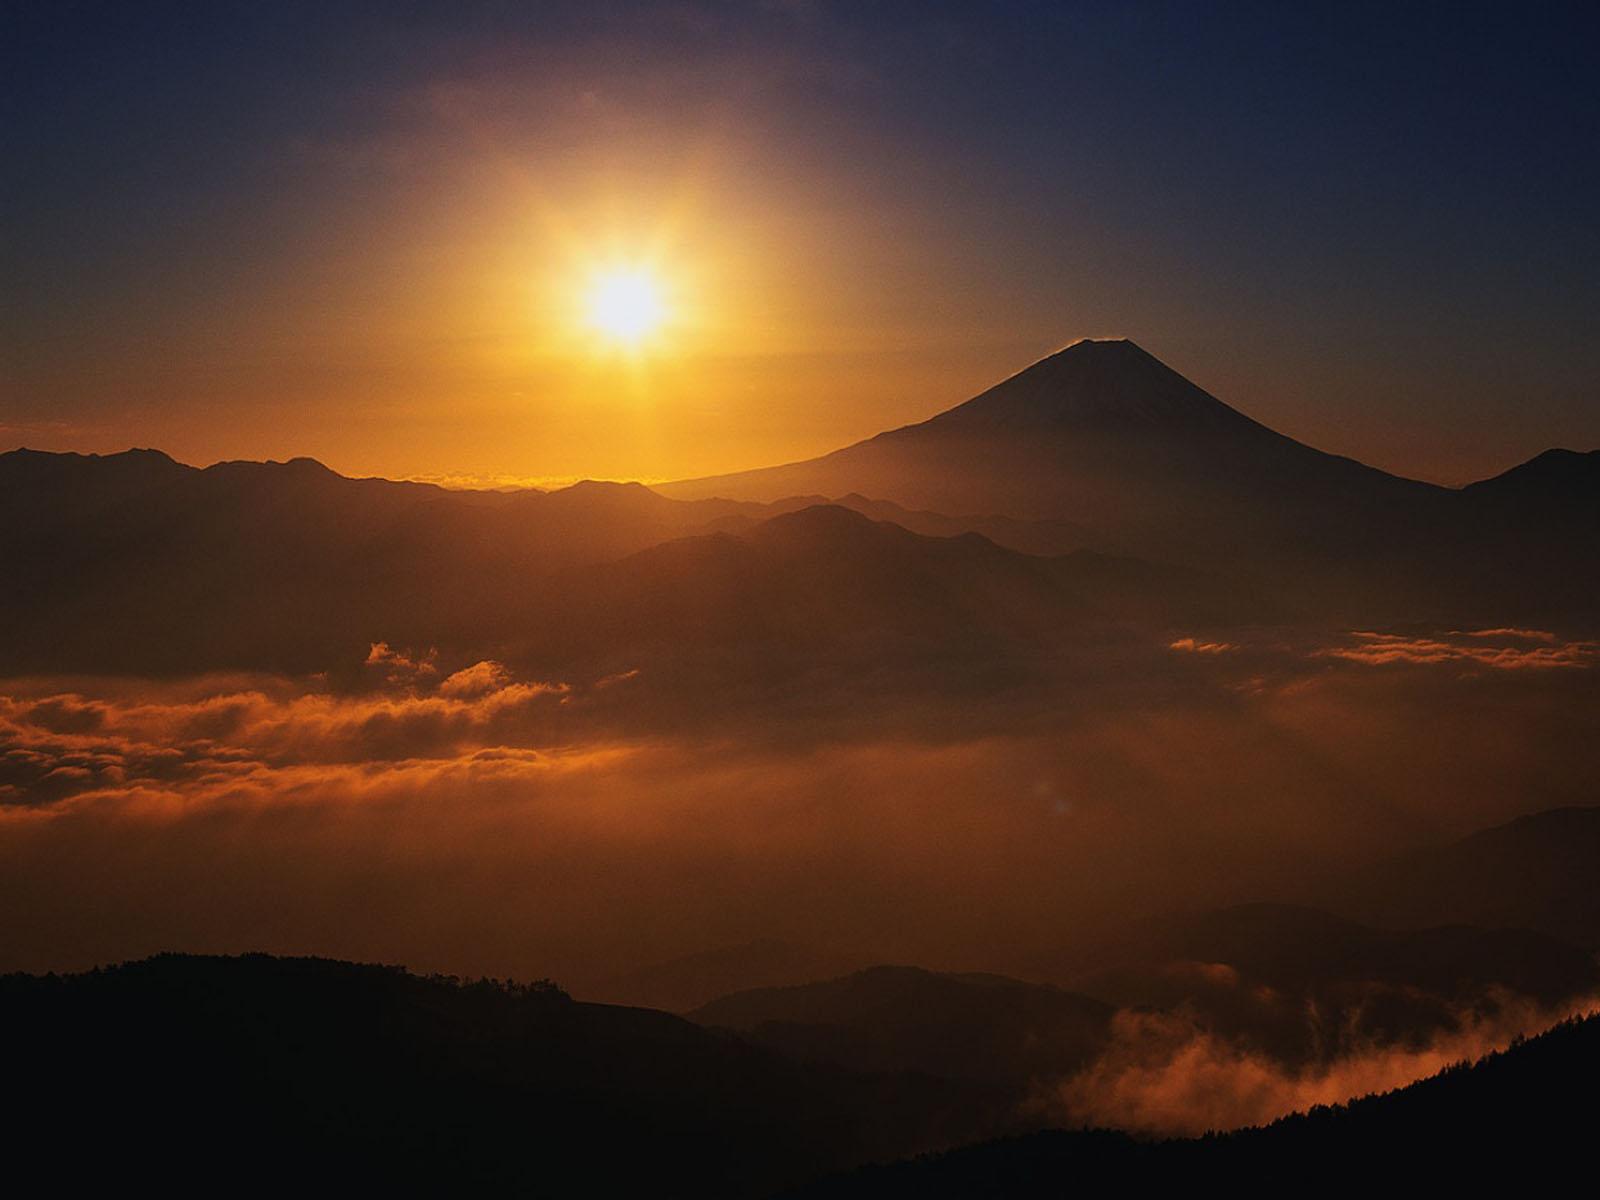 Beautiful Mountain Sunrise Wallpaper images 1600x1200